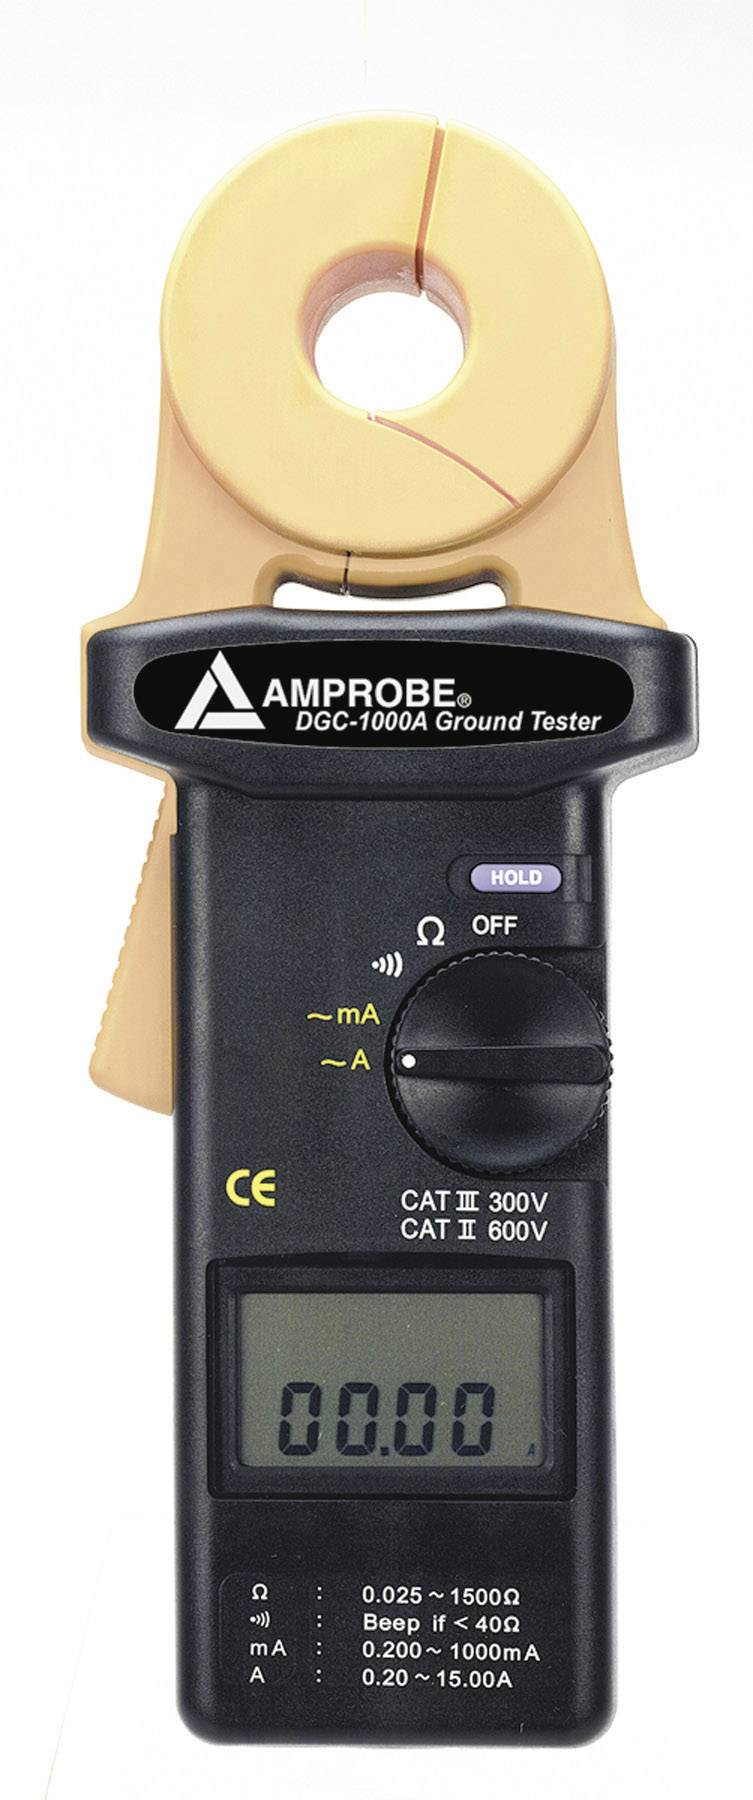 Beha Amprobe DGC-1000A Erdungsmesser, Erdwiderstandsmessgerät, Kalibrováno dle bez certifikátu